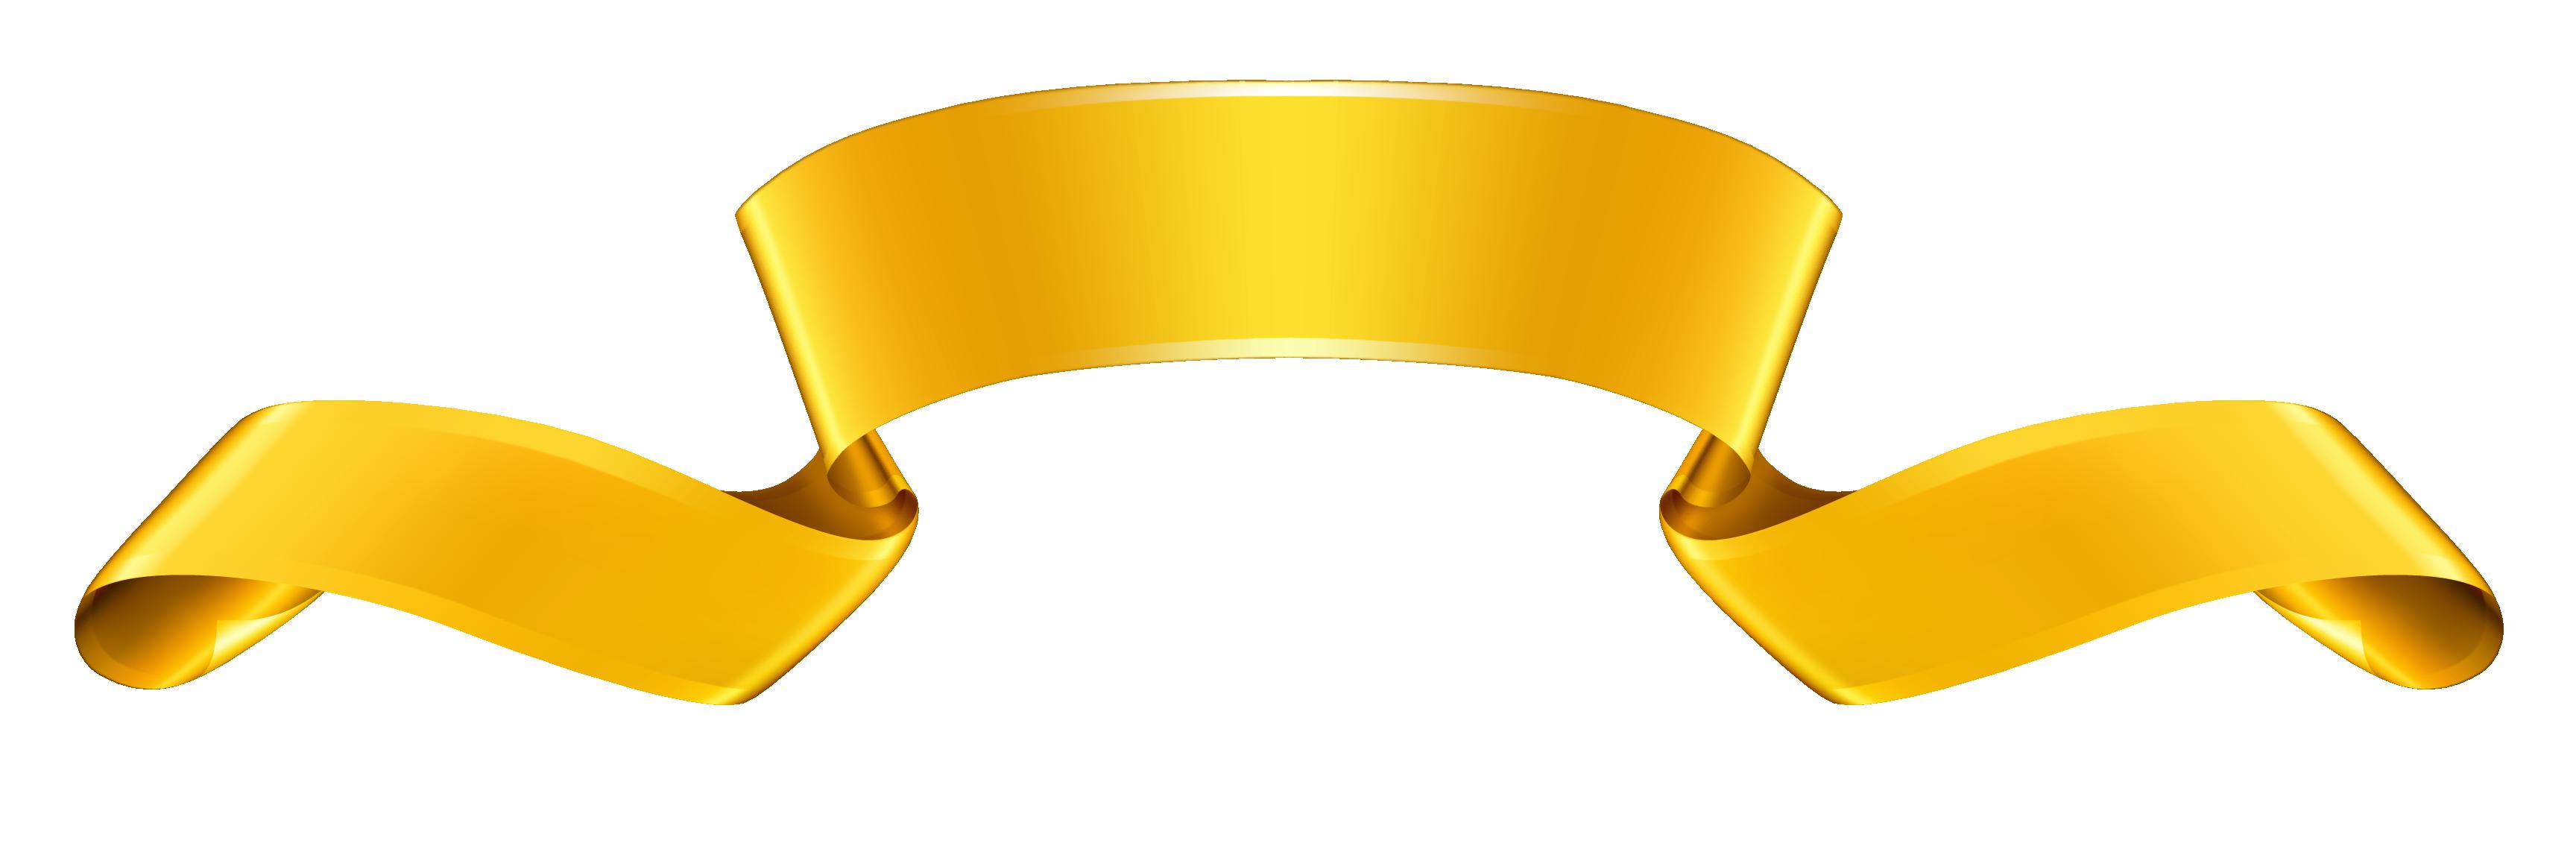 Gold Banner